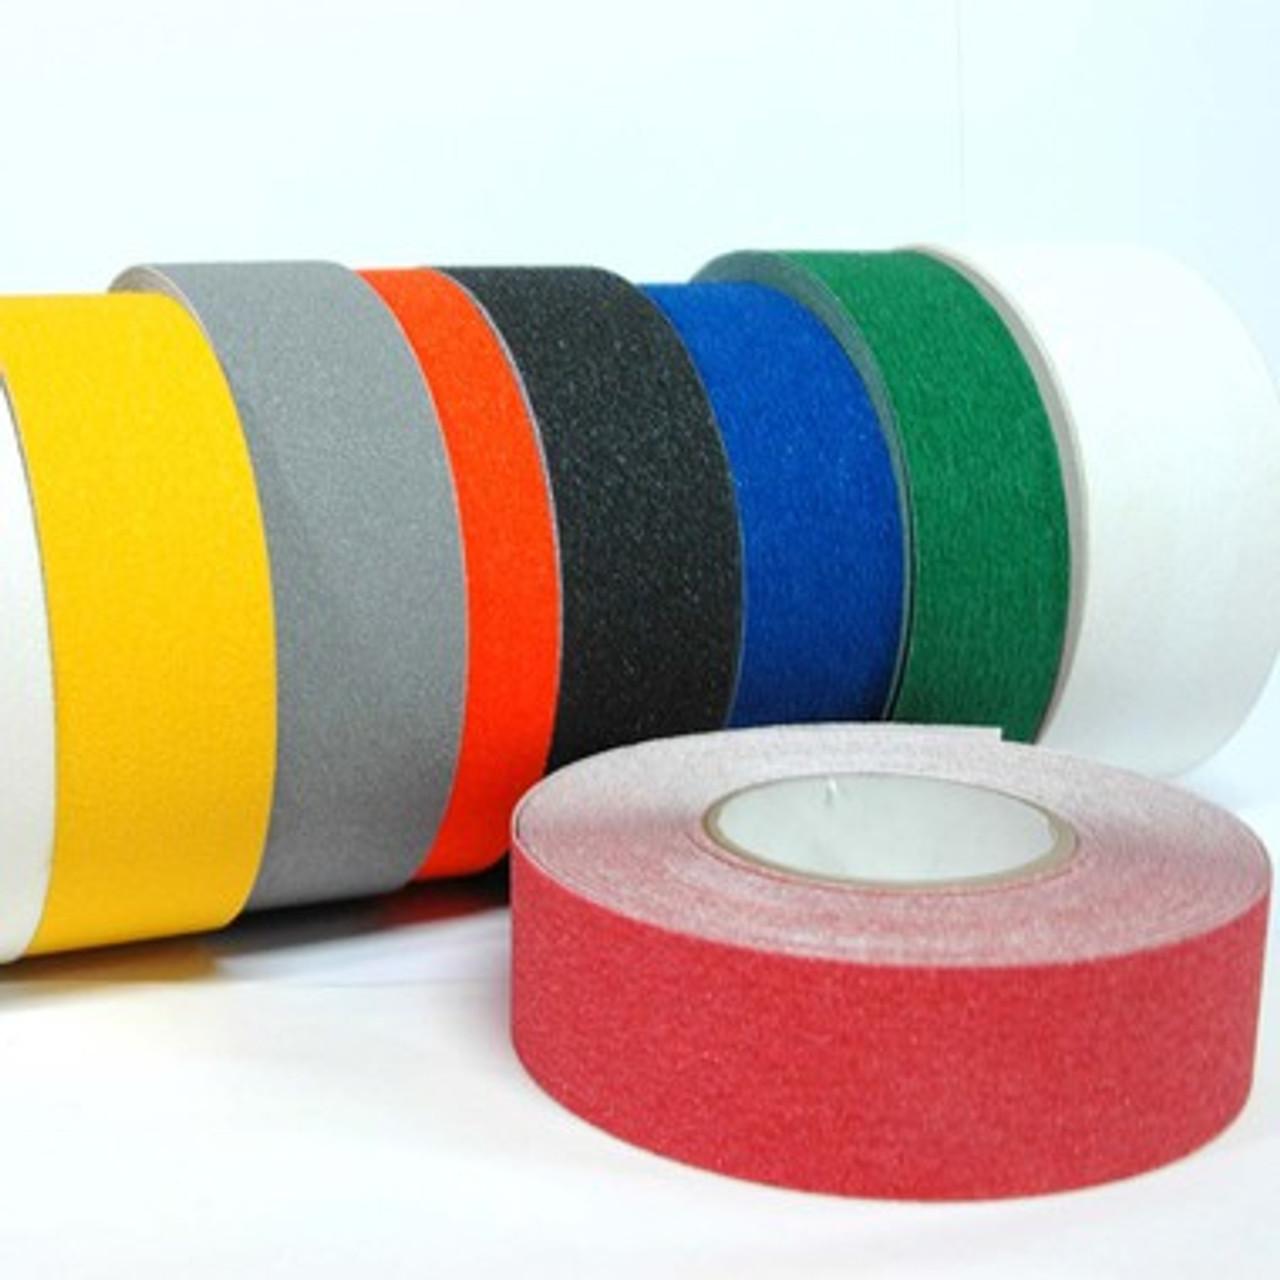 Image result for Anti Slip Tape